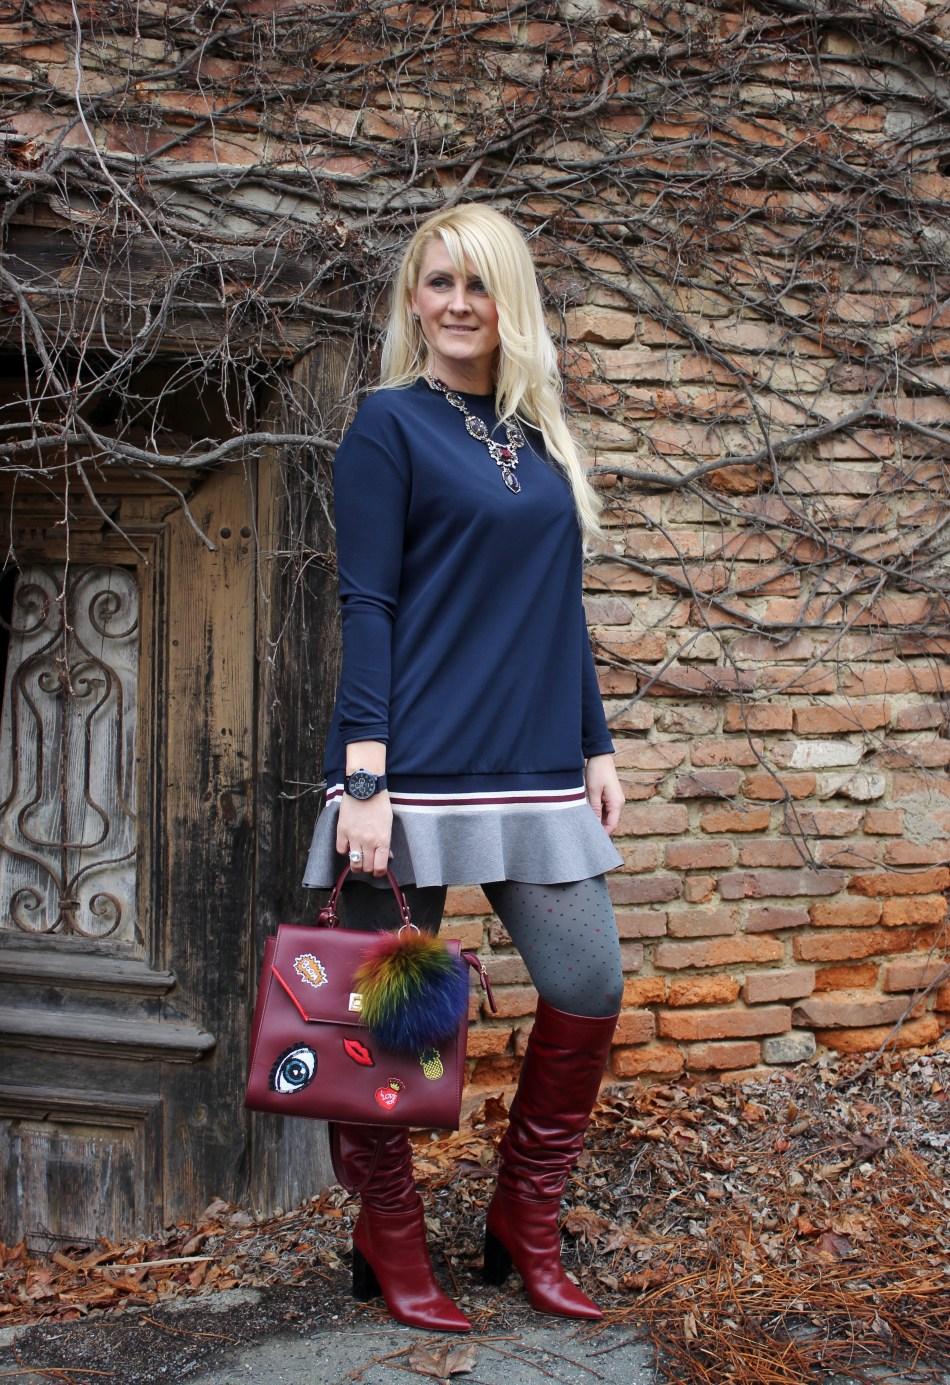 Dunkelrote-Boots-Overknees-Mini-Dress-carrieslifestyle-Tamara-Prutsch